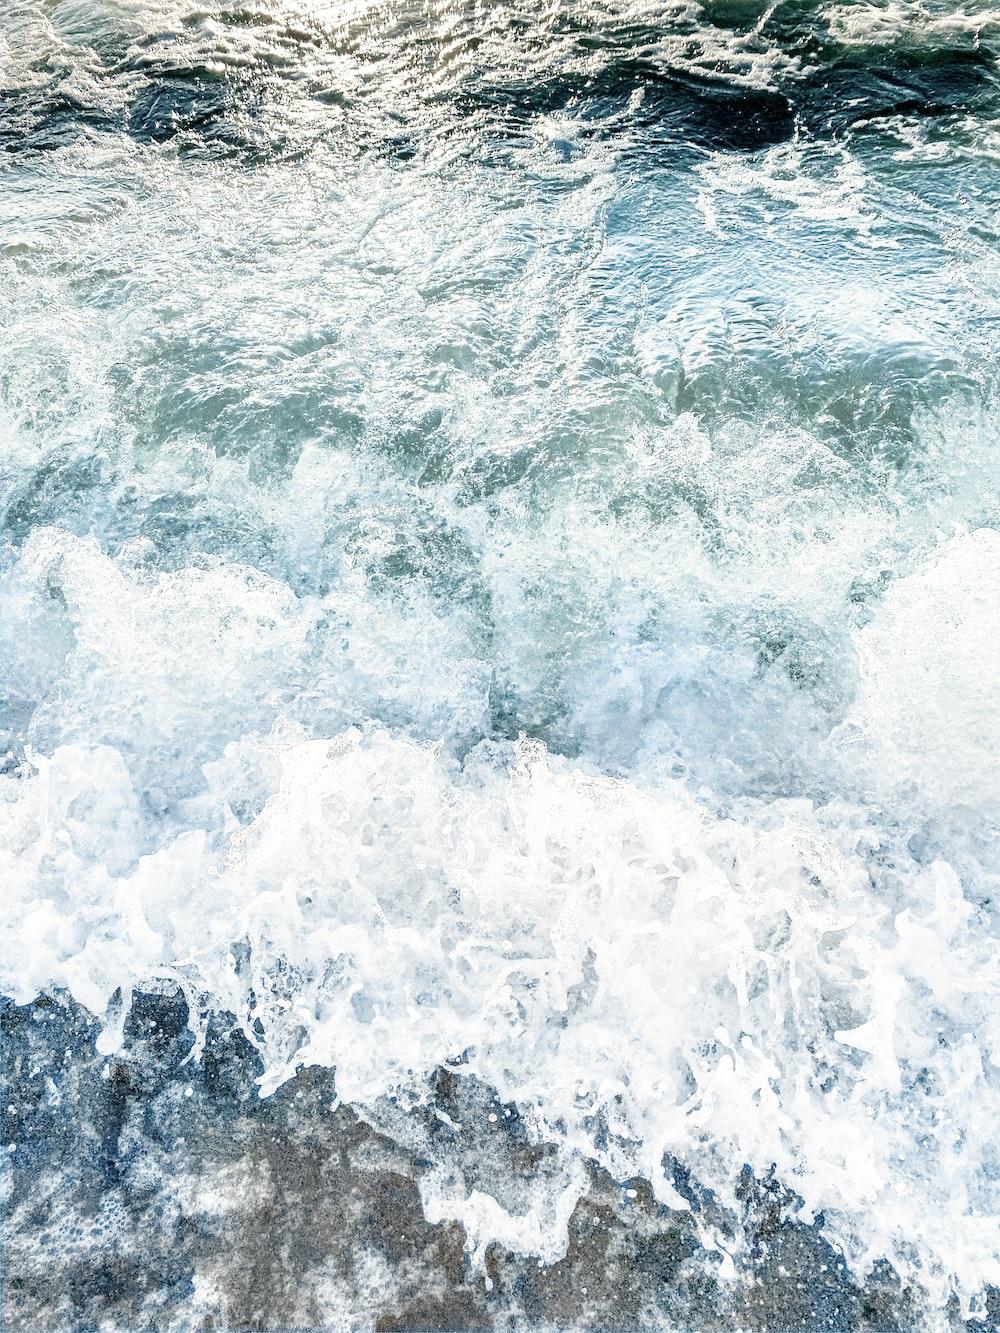 sea wave on shore